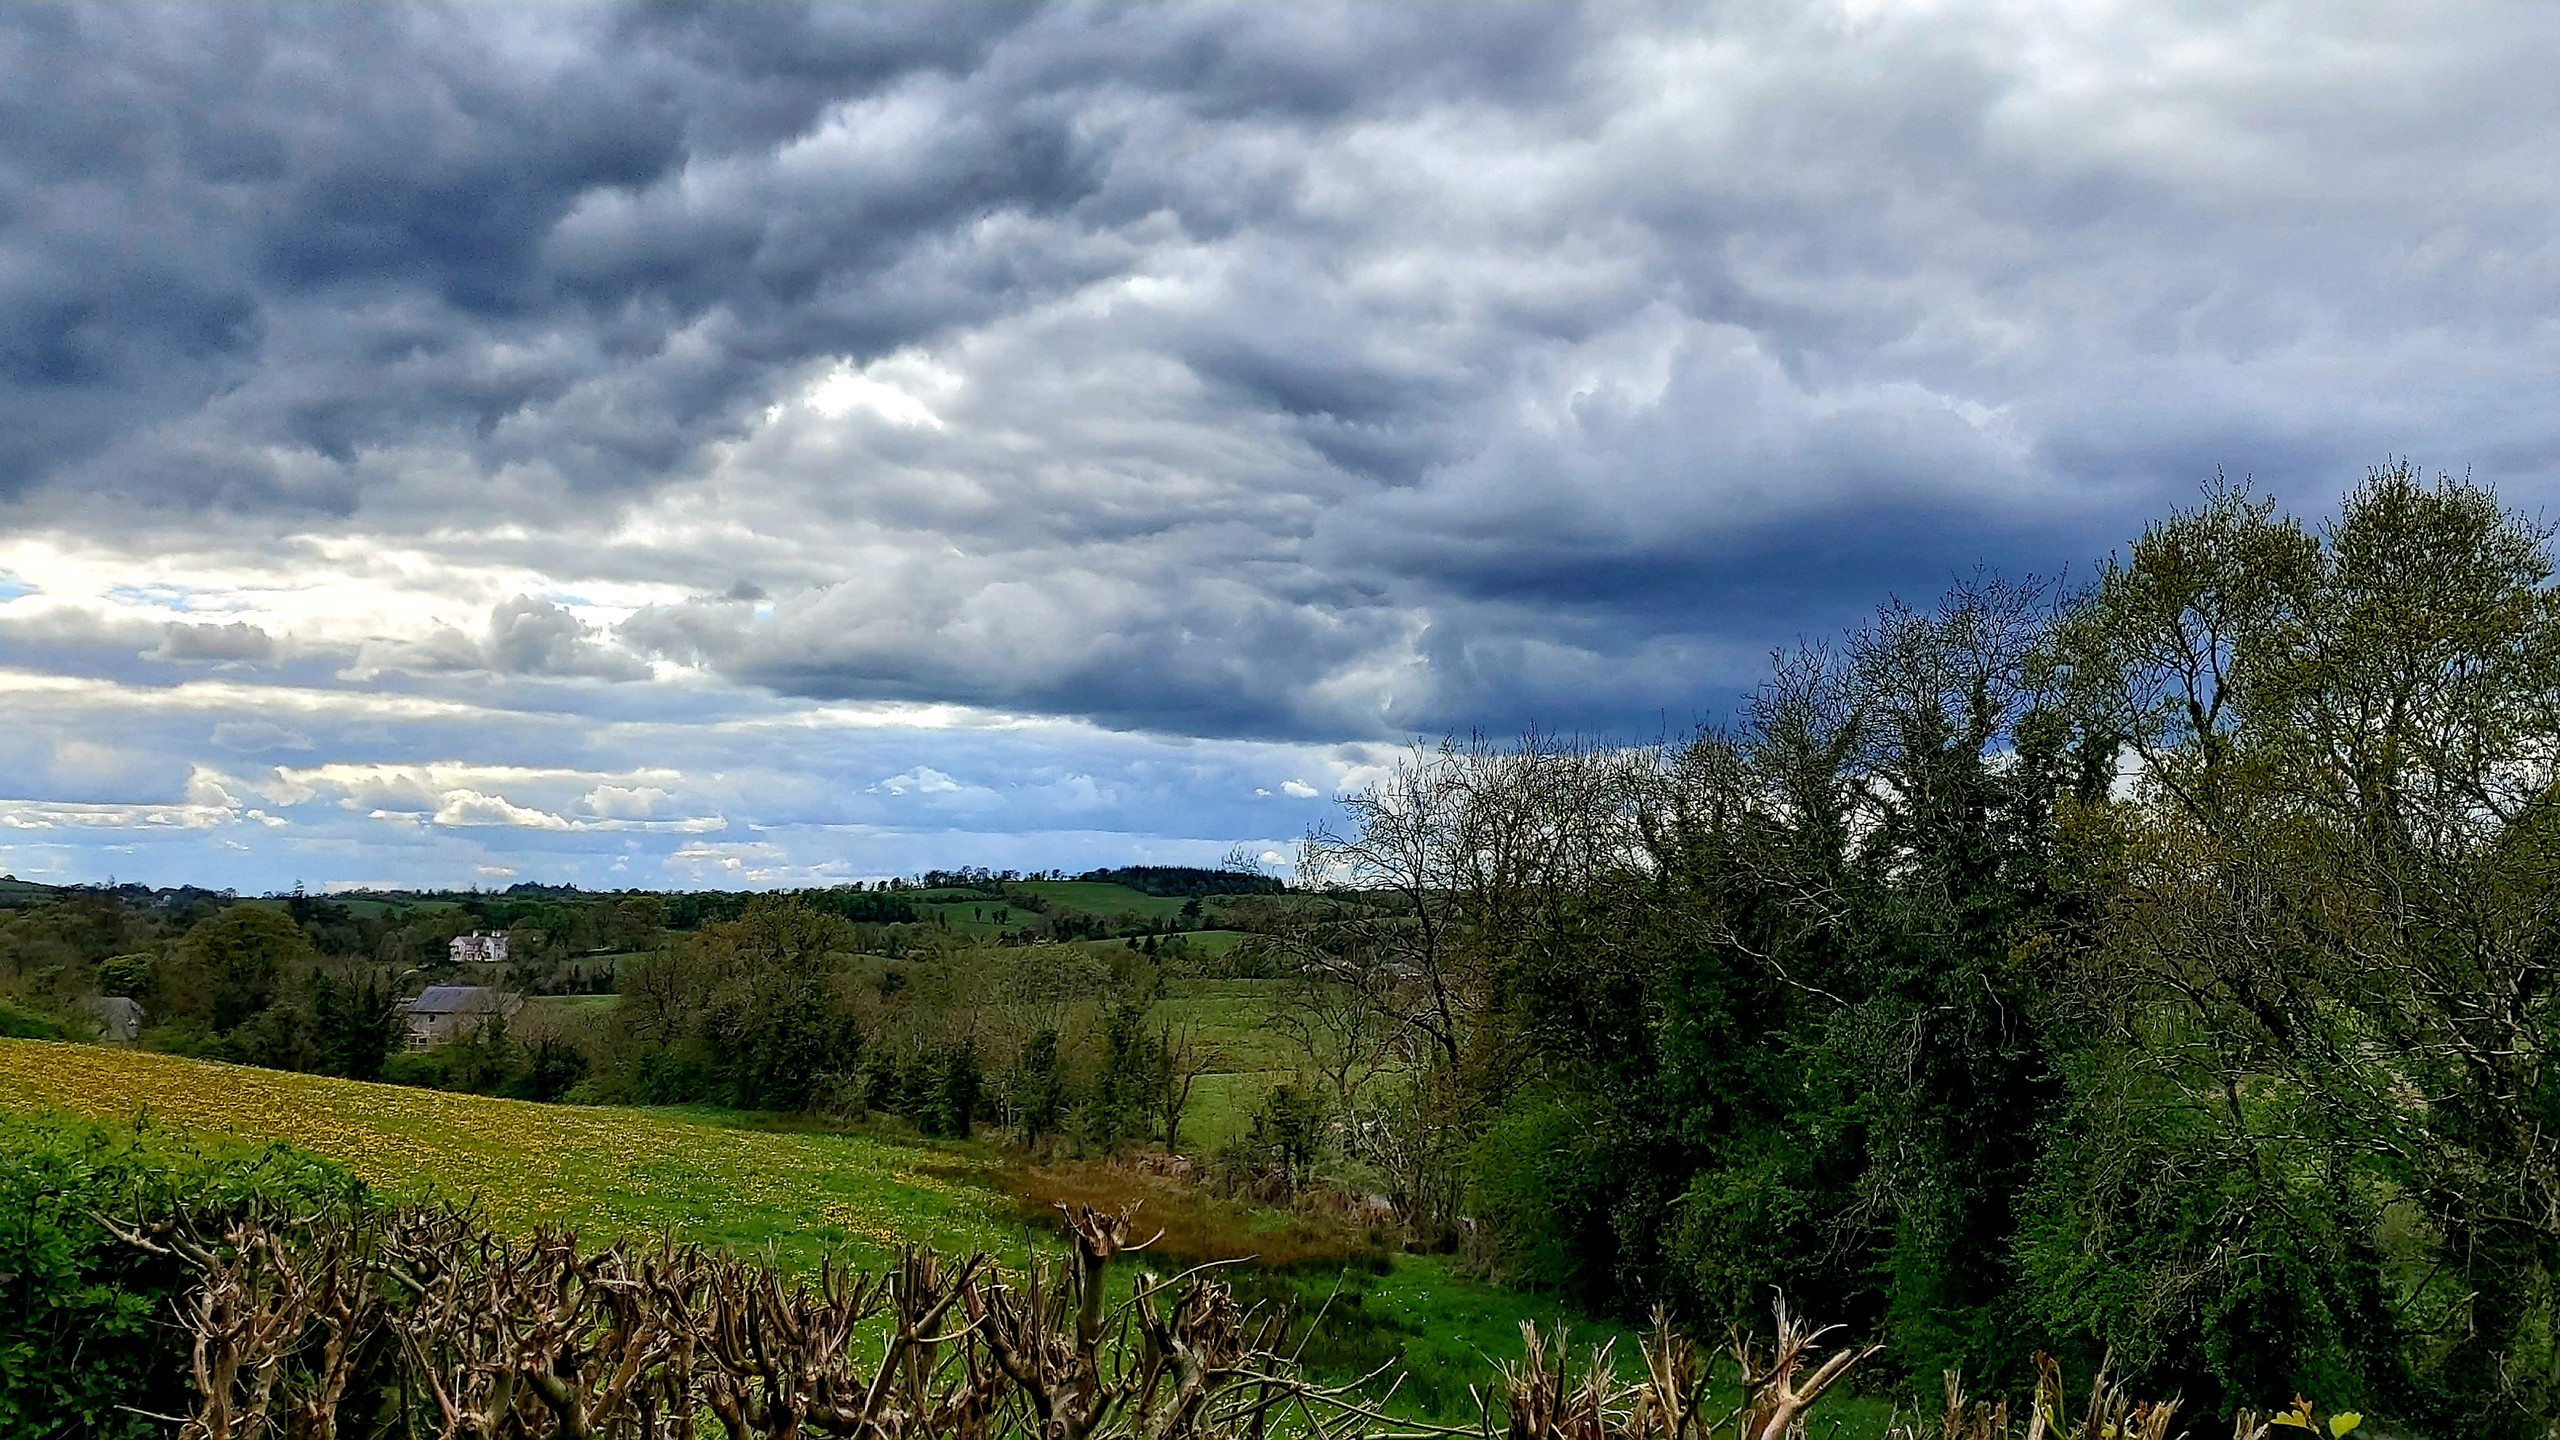 striking cloudy sky